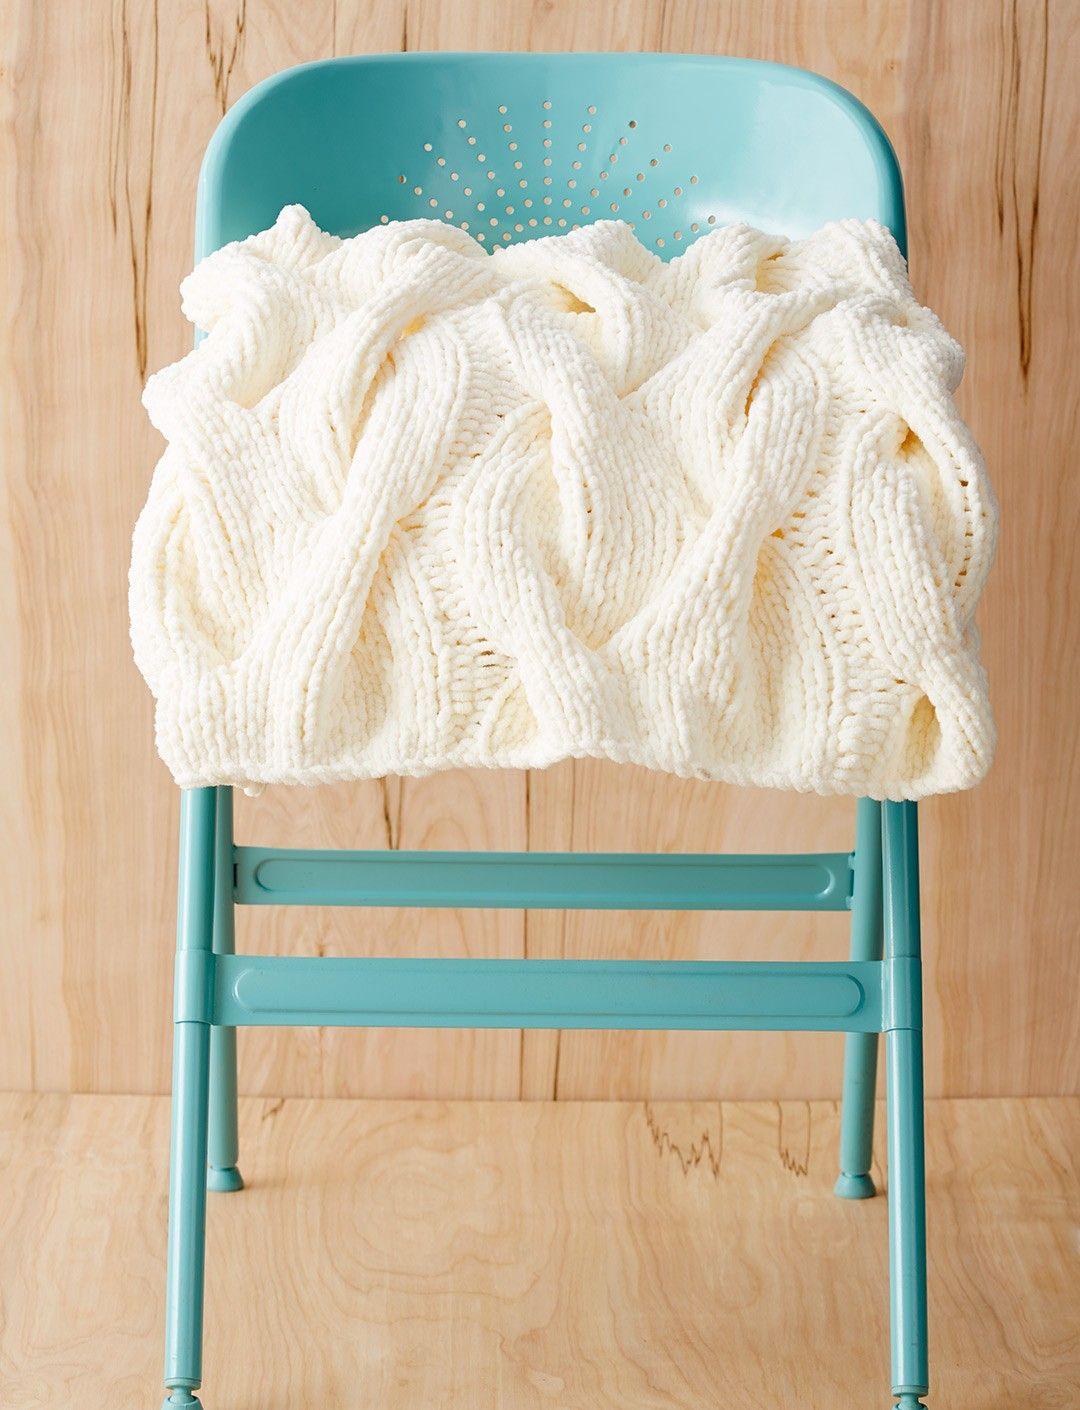 Yarnspirations.com - Bernat Cozy Cables Blanket - Patterns ...